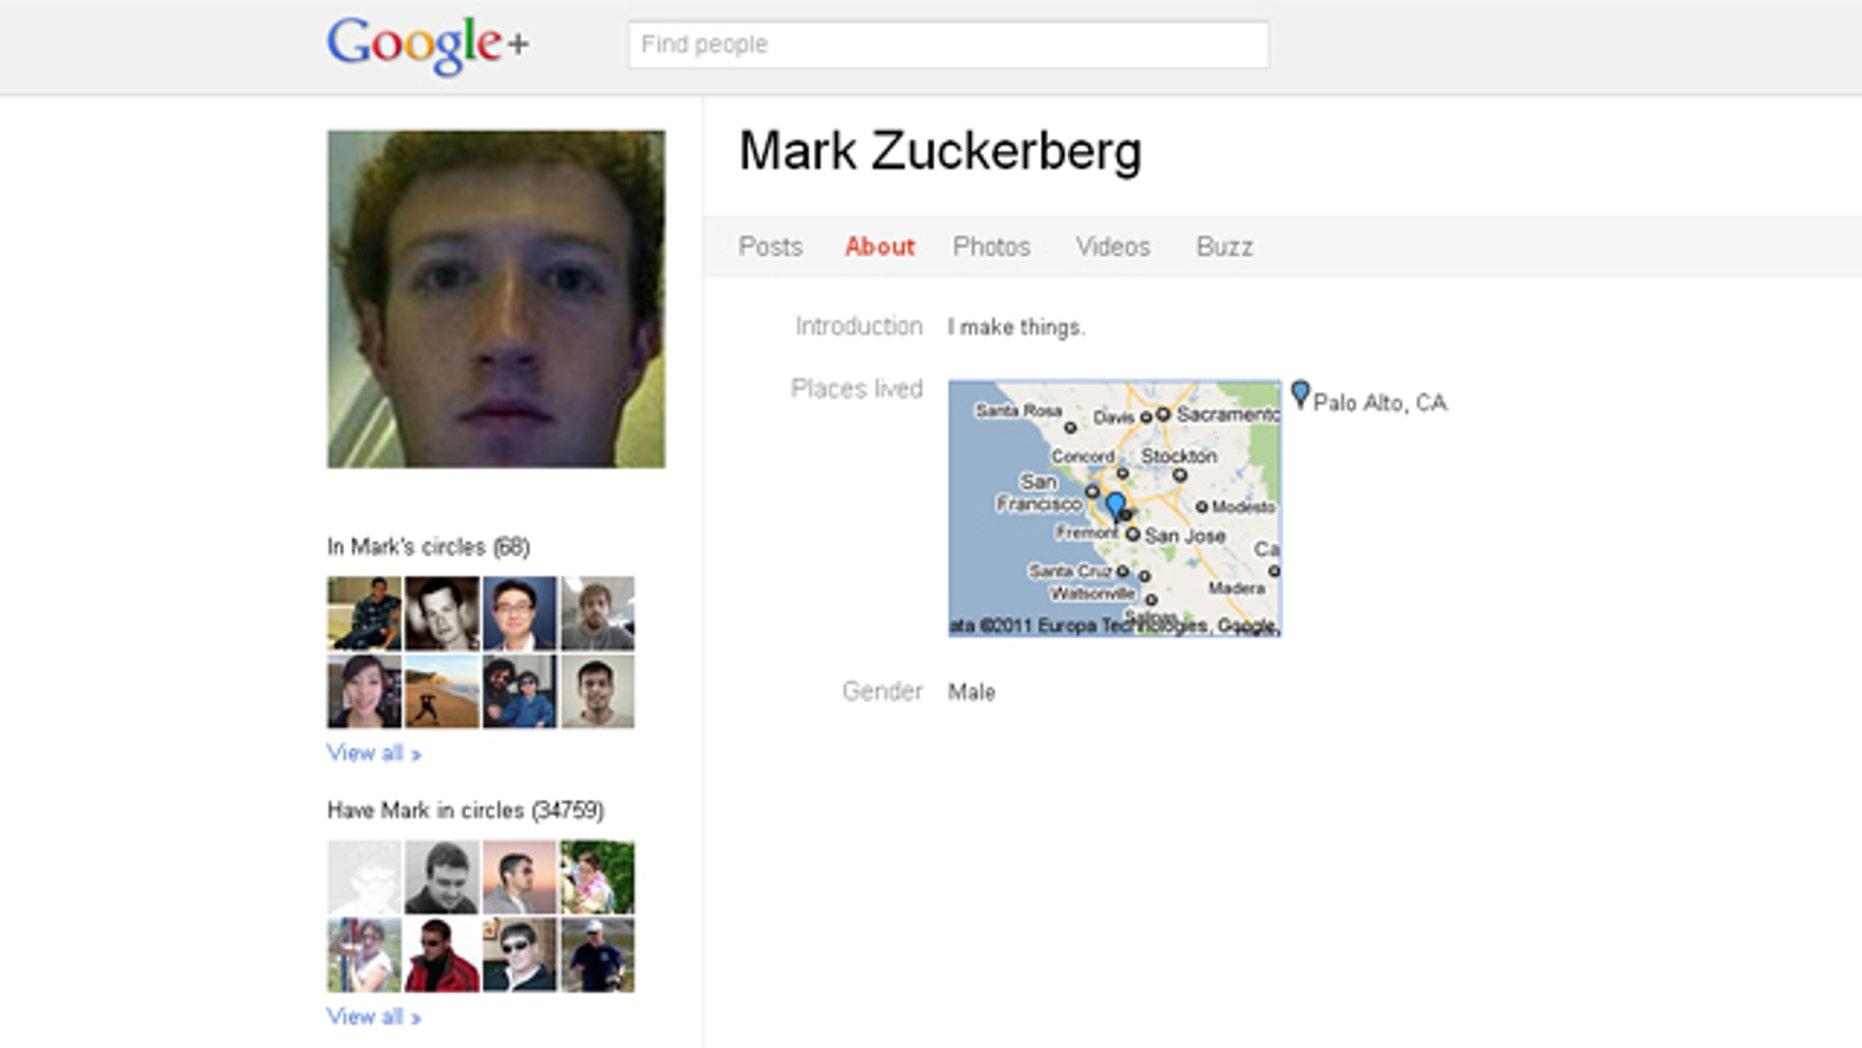 Mark Zuckerberg's Google+ profile.